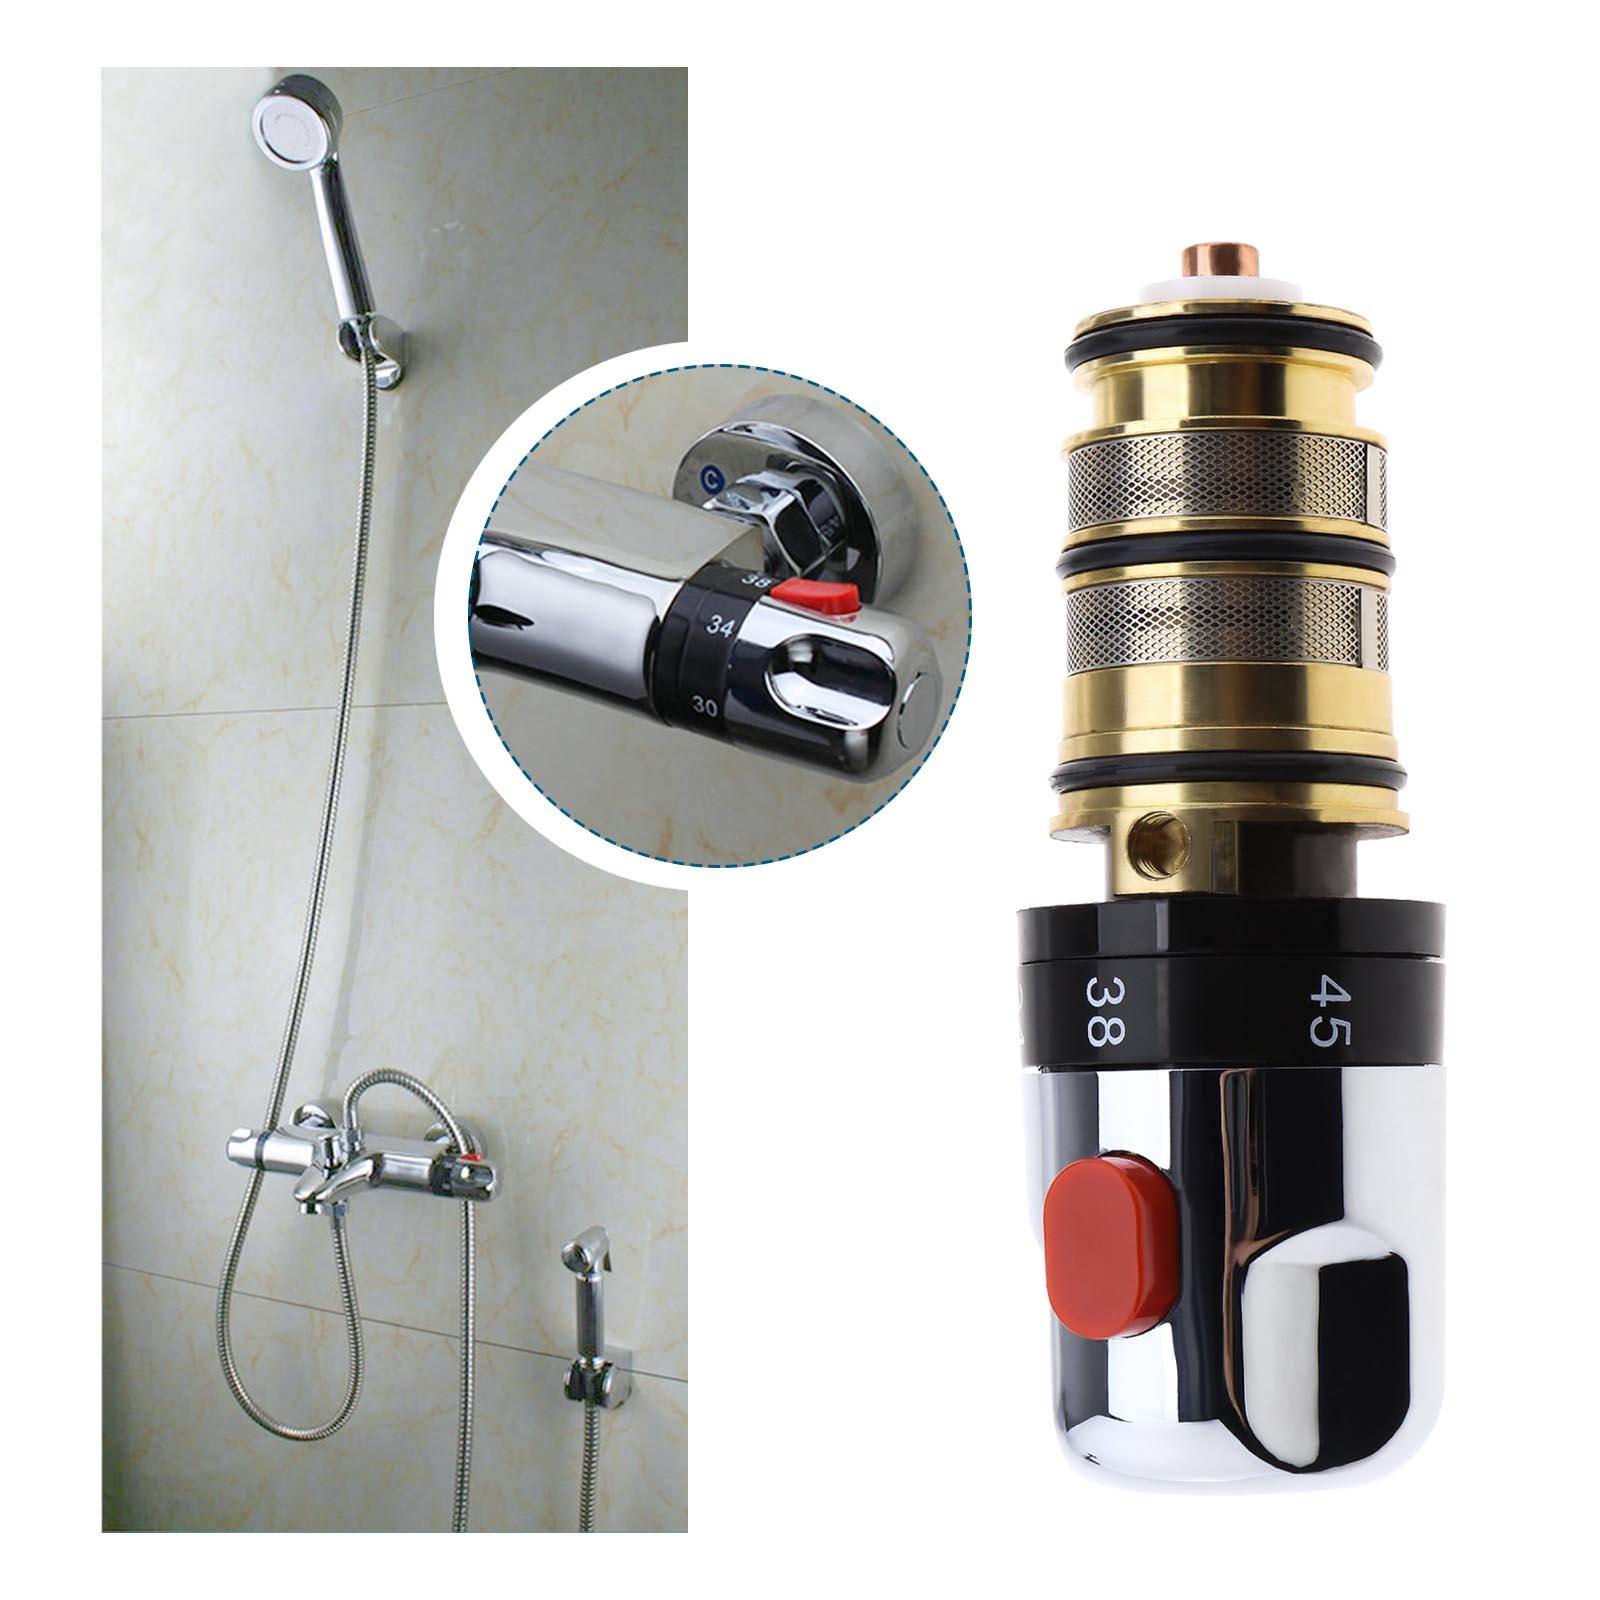 Adjustable Thermostatic Bath Mixer Tap Taps Shower Valve